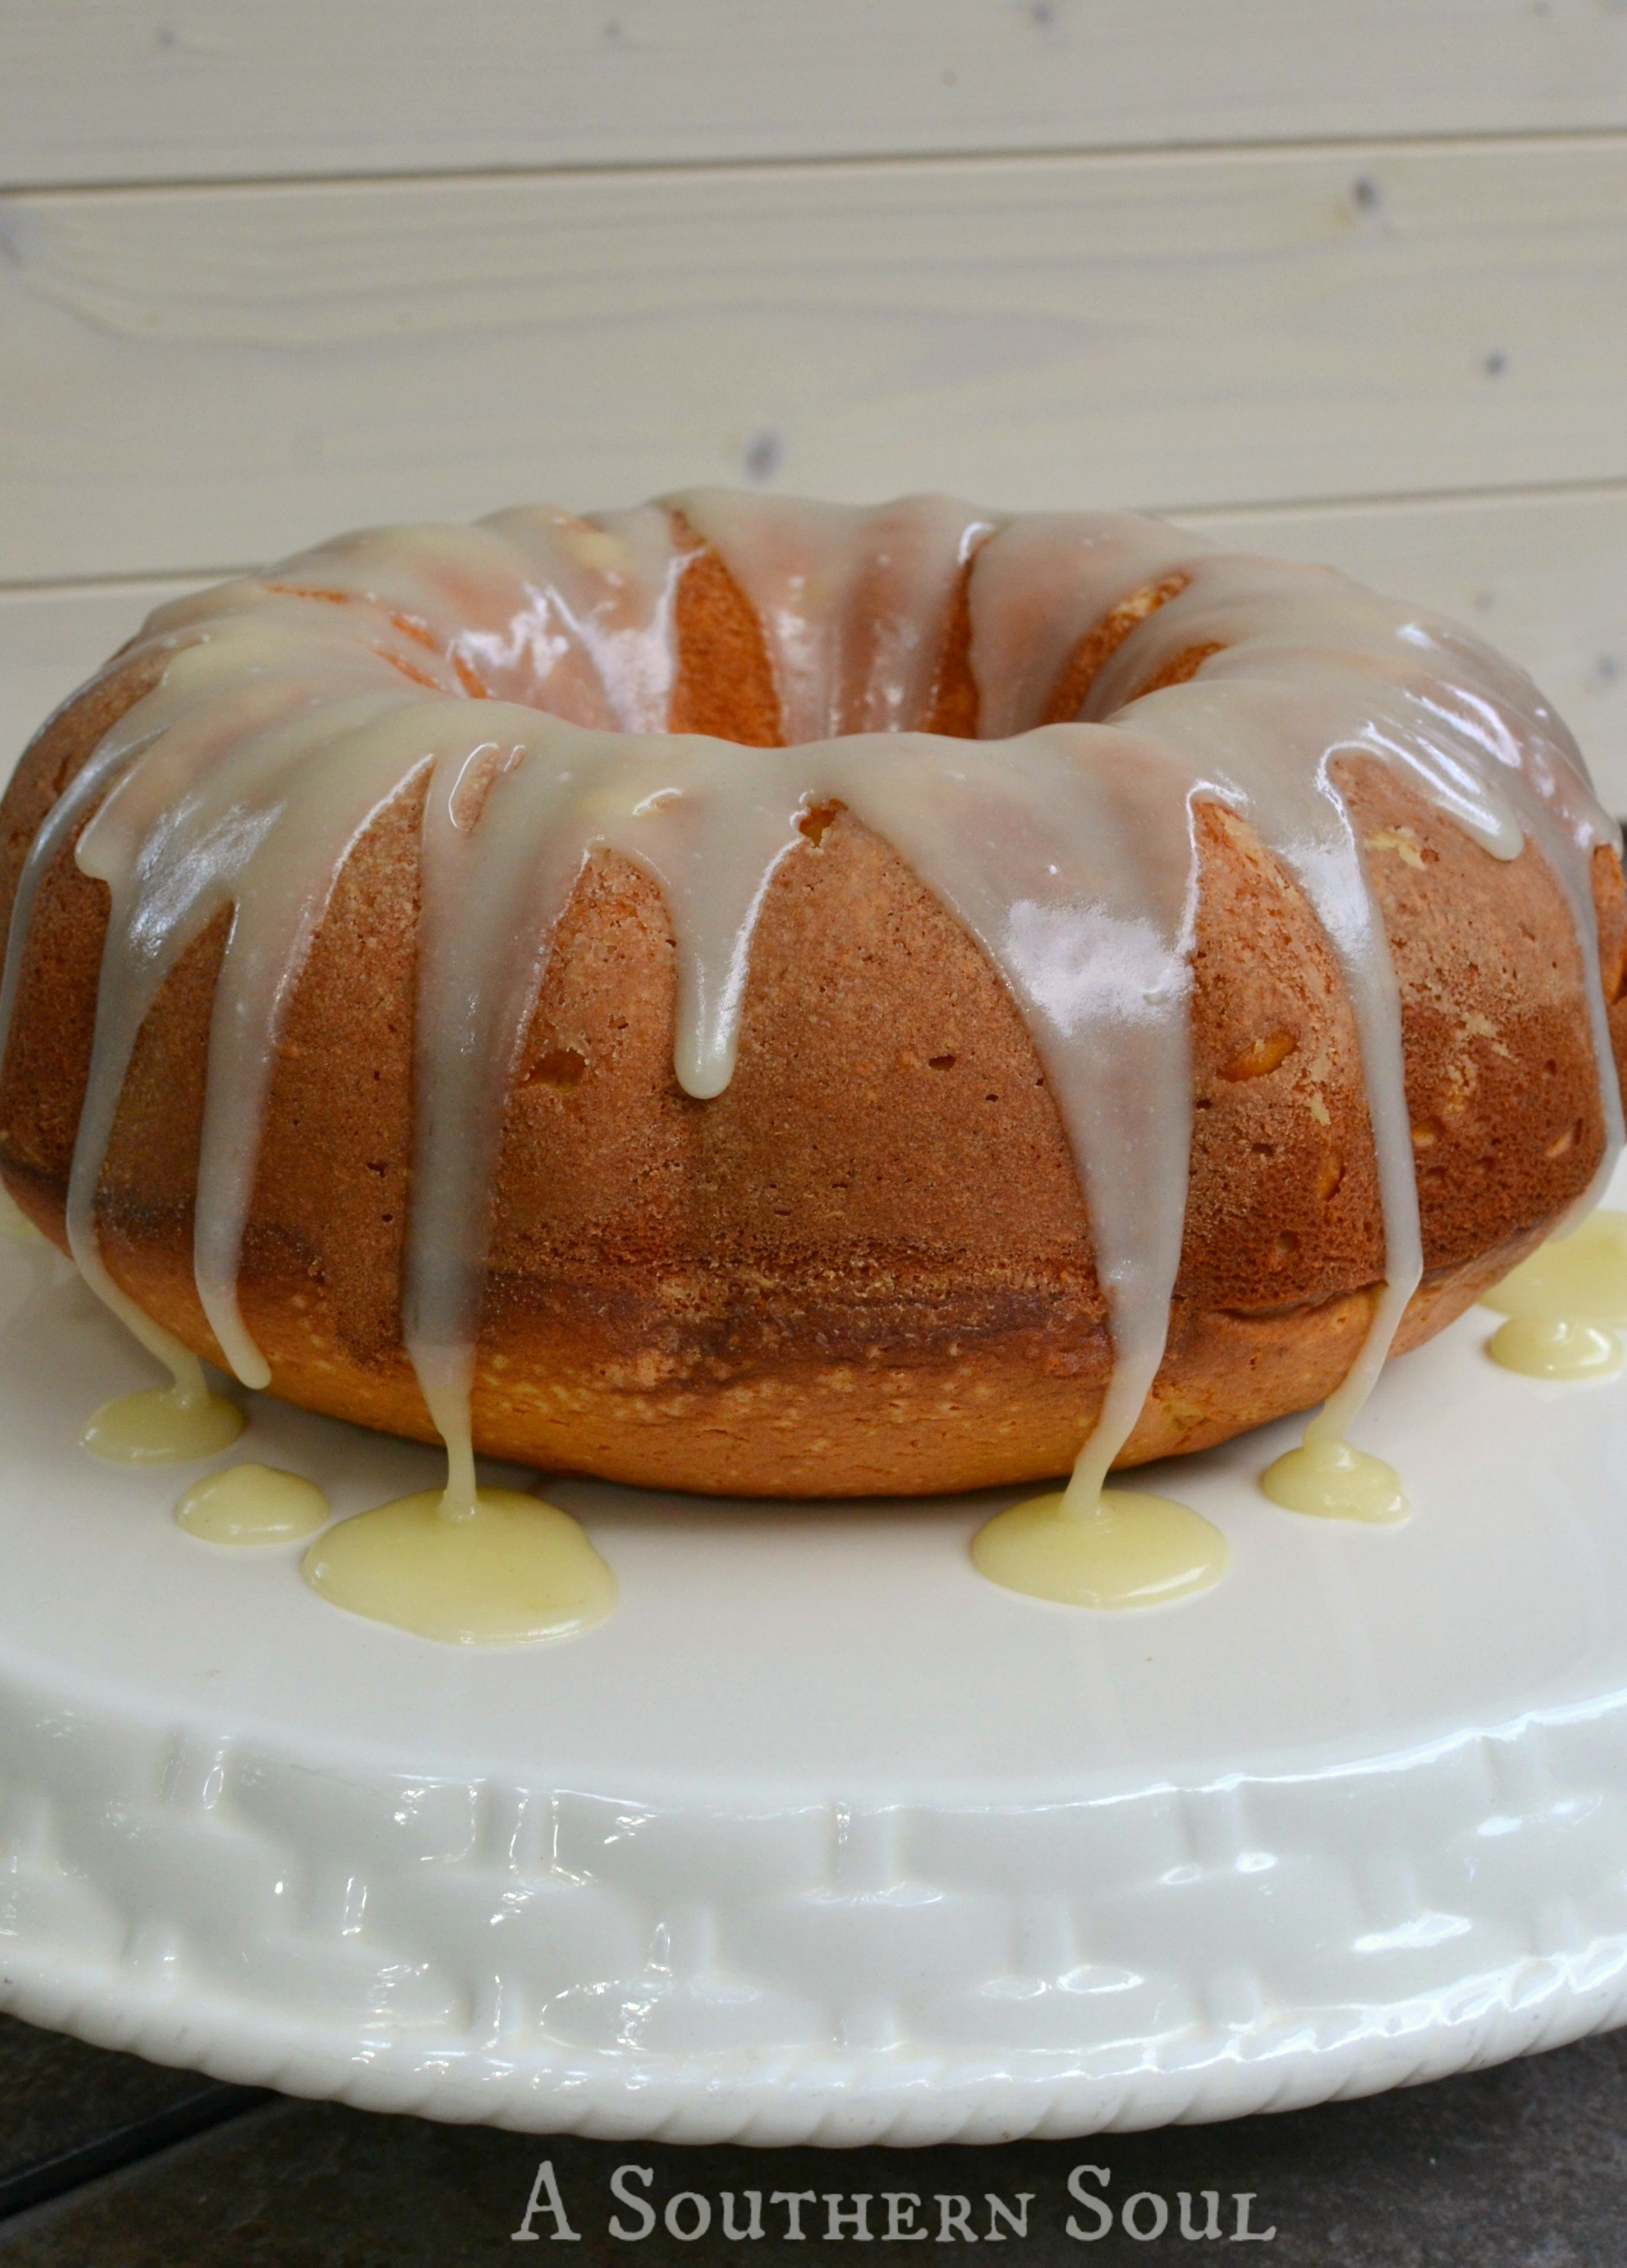 Pumpkin cinnamon cake with brown butter glaze